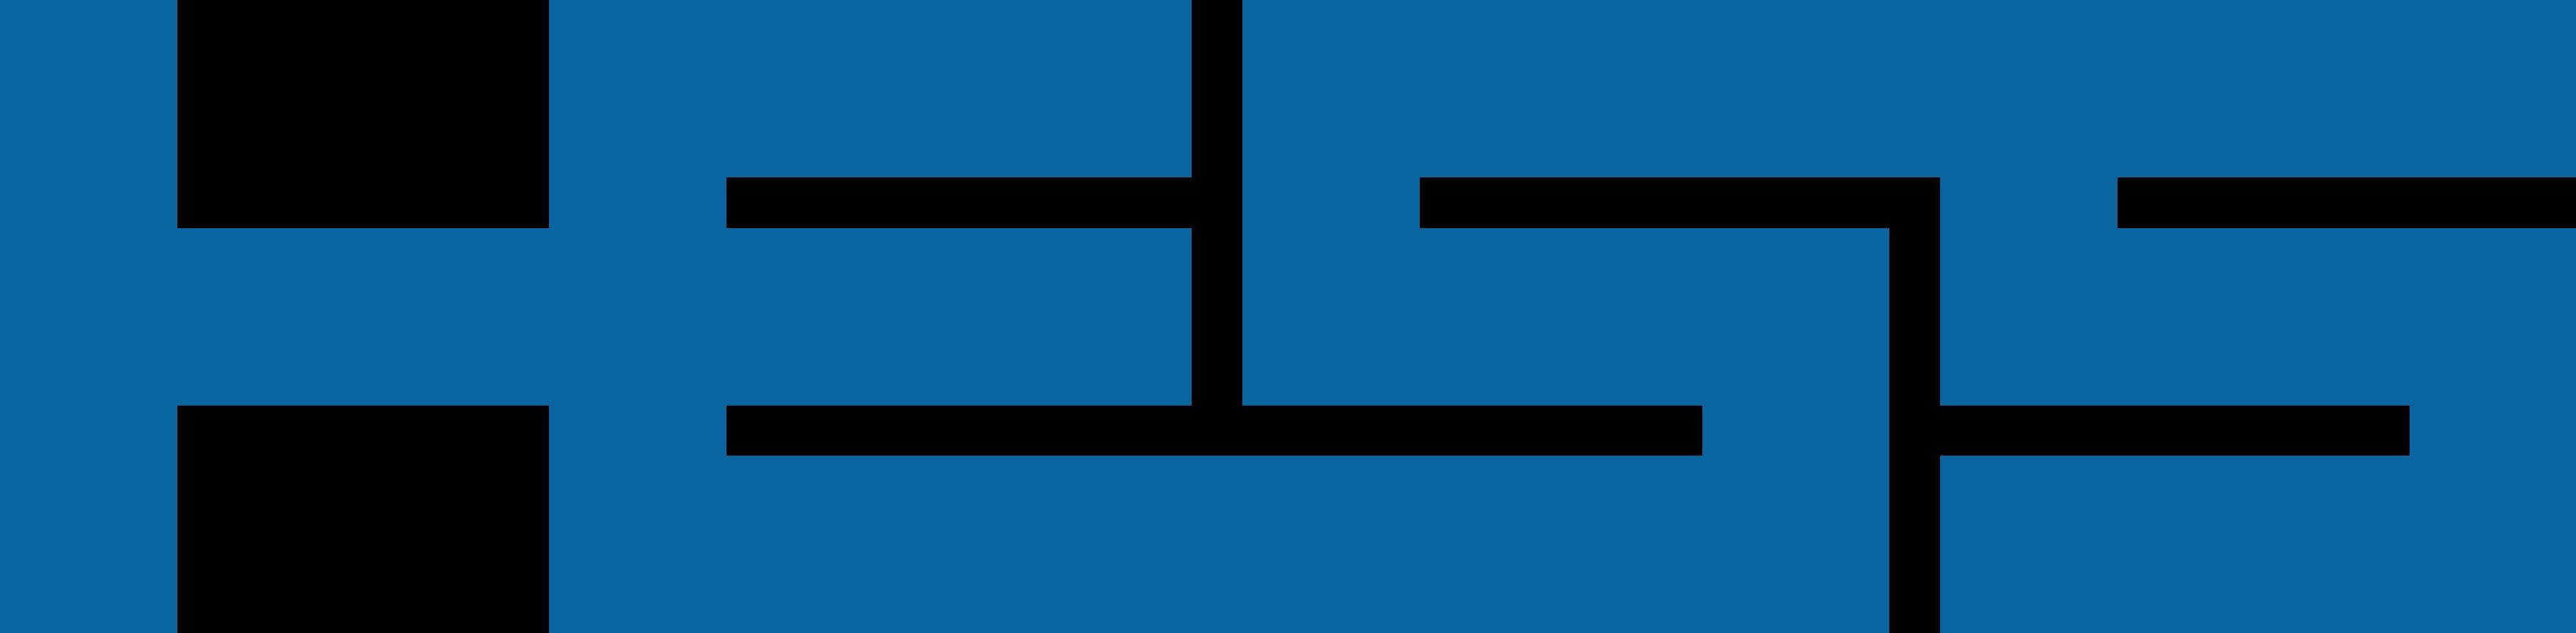 HESS AG Fahrzeugzubehör & Ersatzteile